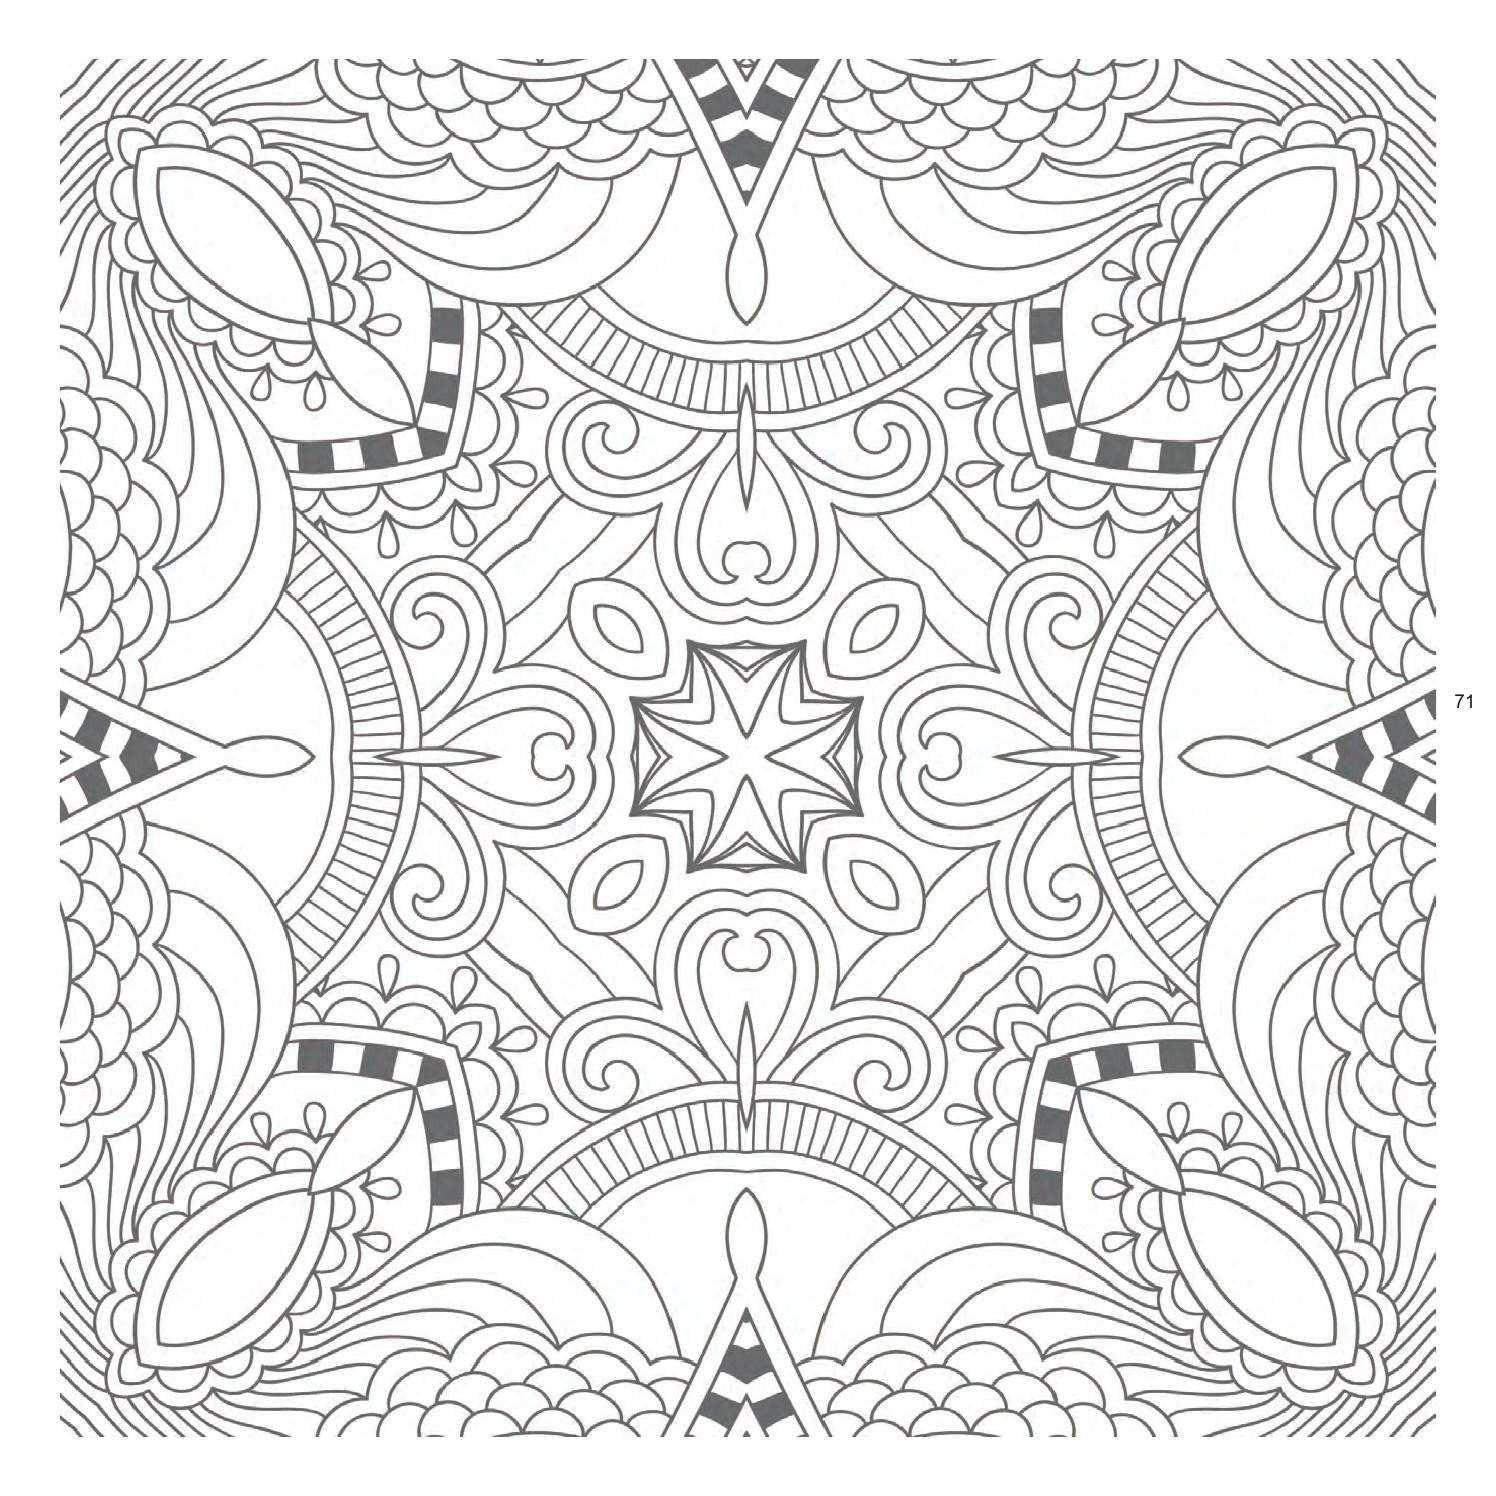 Free Mandala Coloring Pages Free Mandala Coloring Pages For Adults Unique Celtic Coloring Pages